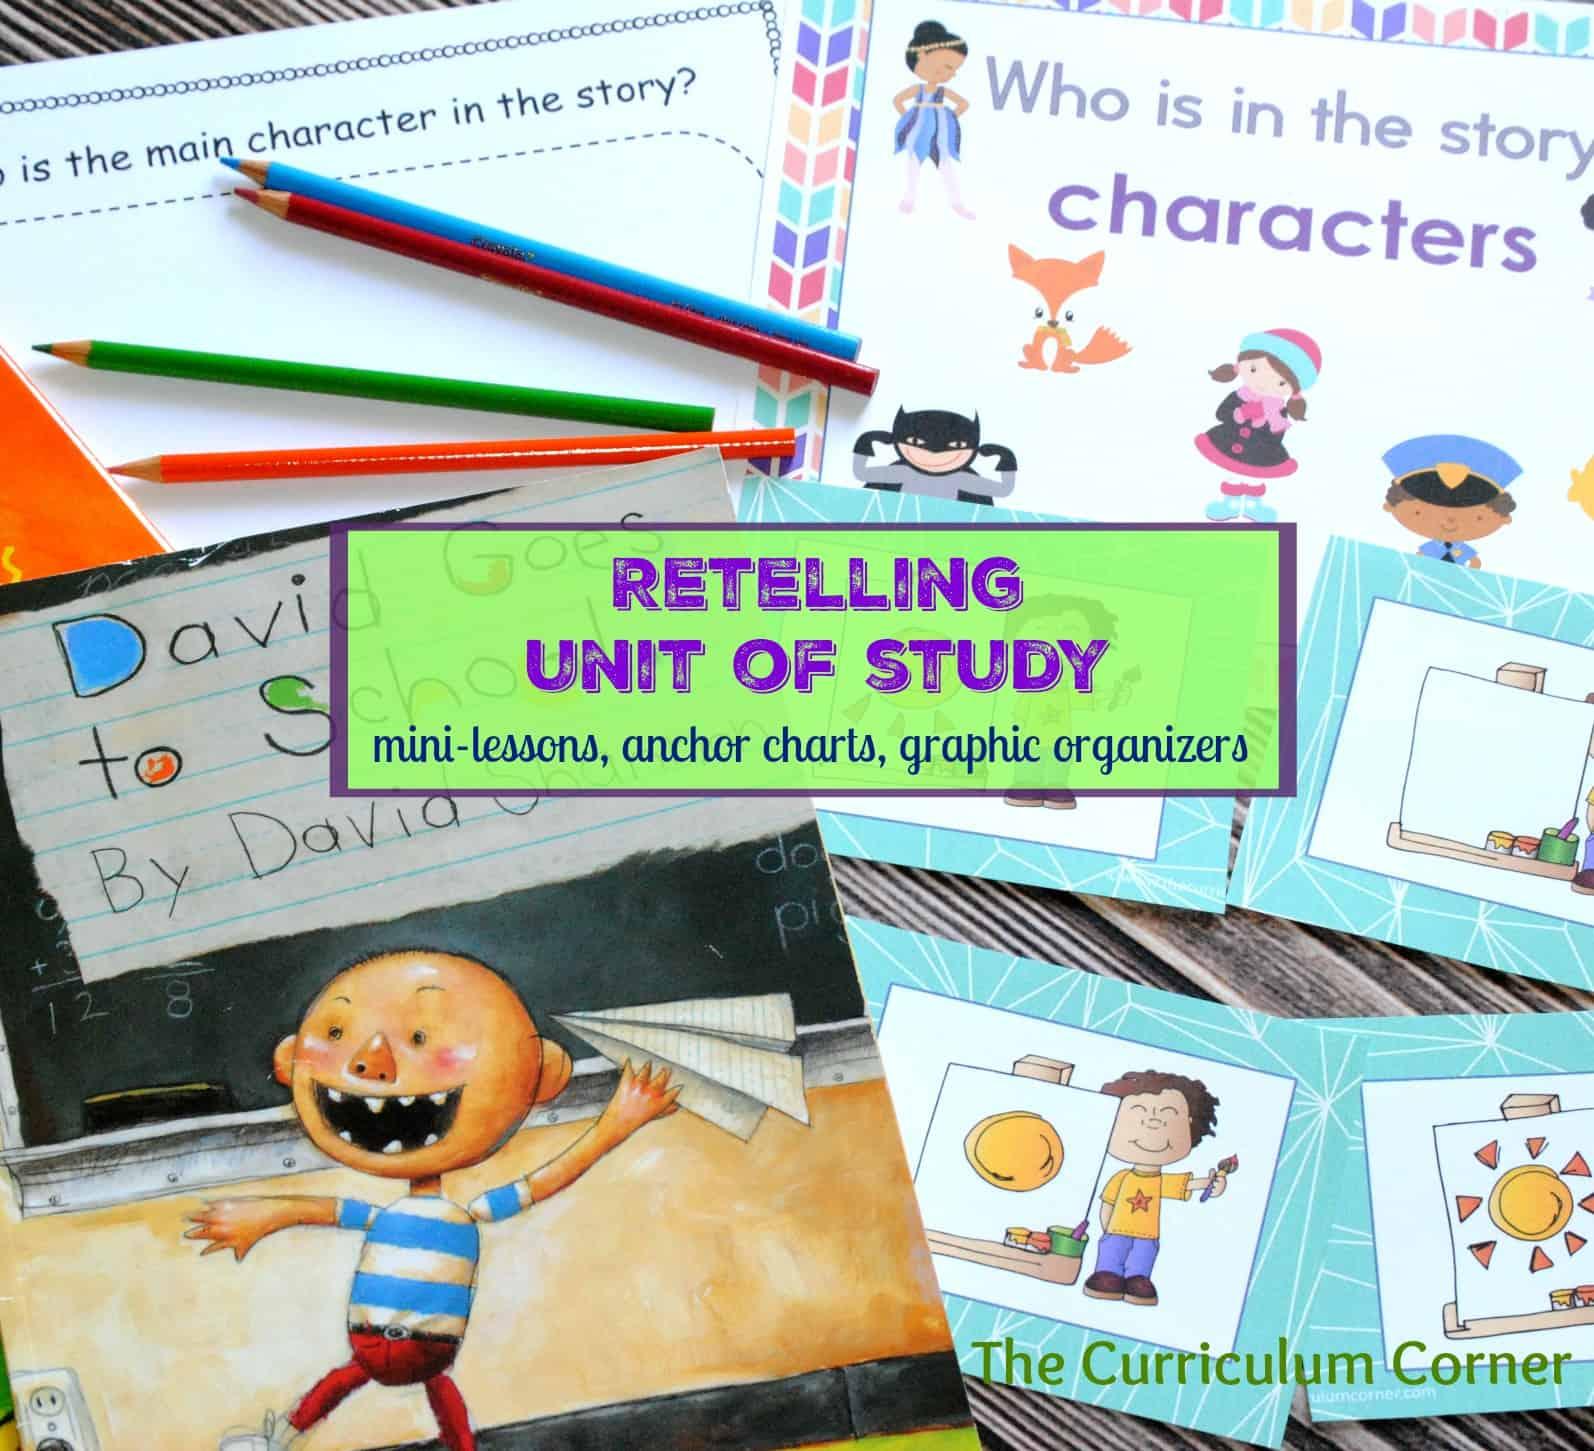 Retelling Unit of Study